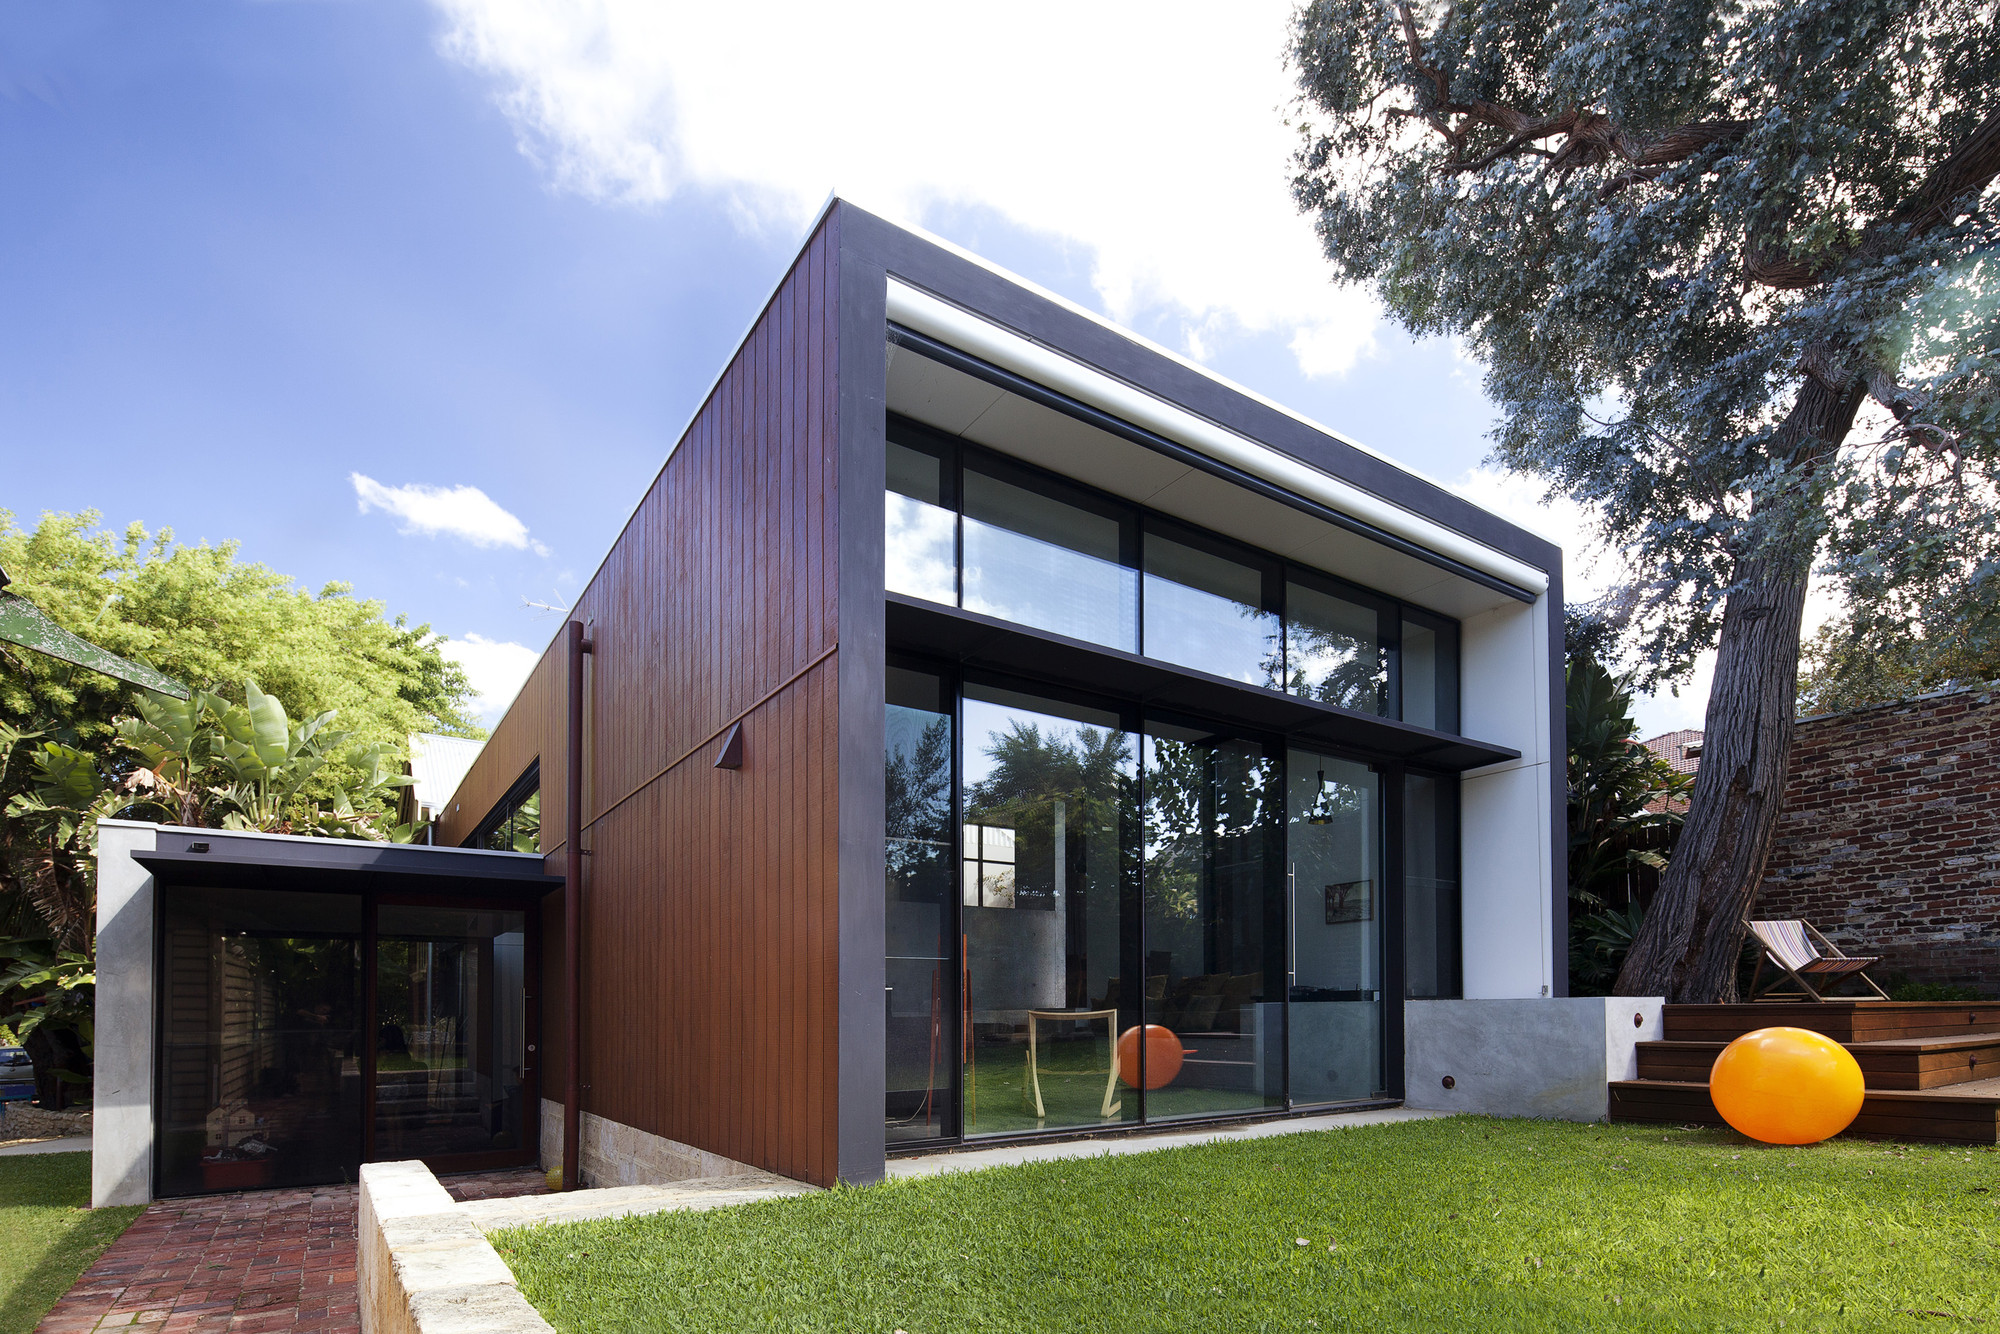 Maylands Additions / Jonathan Lake Architects, © Robert Frith